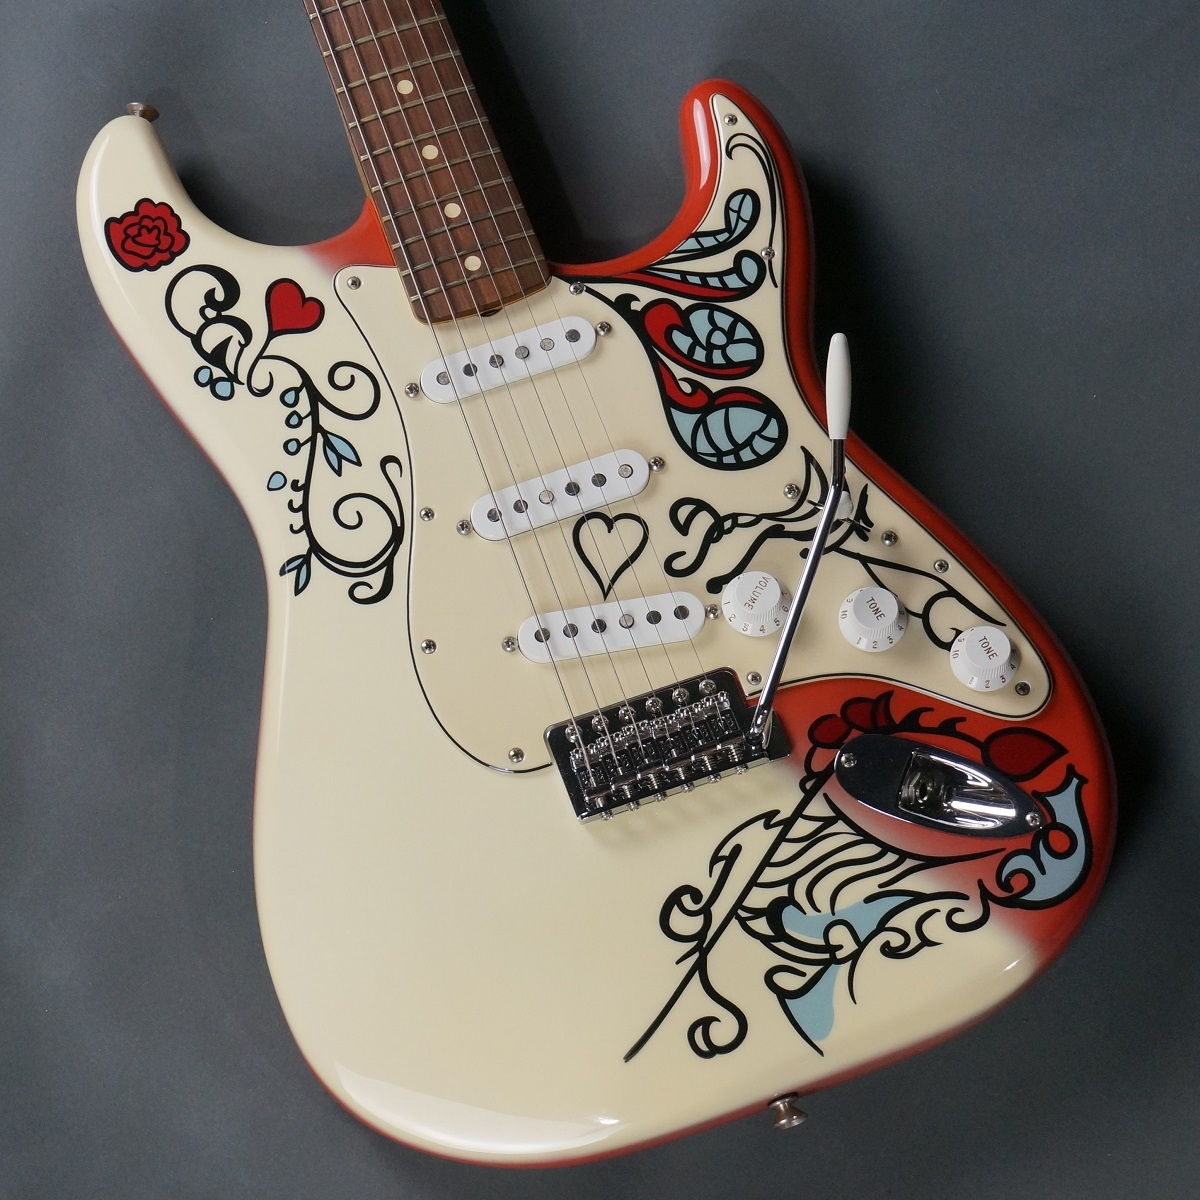 Fender Jimi Hendrix Monterey Stratocaster / used 【クリスマスセール!!お急ぎください!!限定モデルの中古品!!】